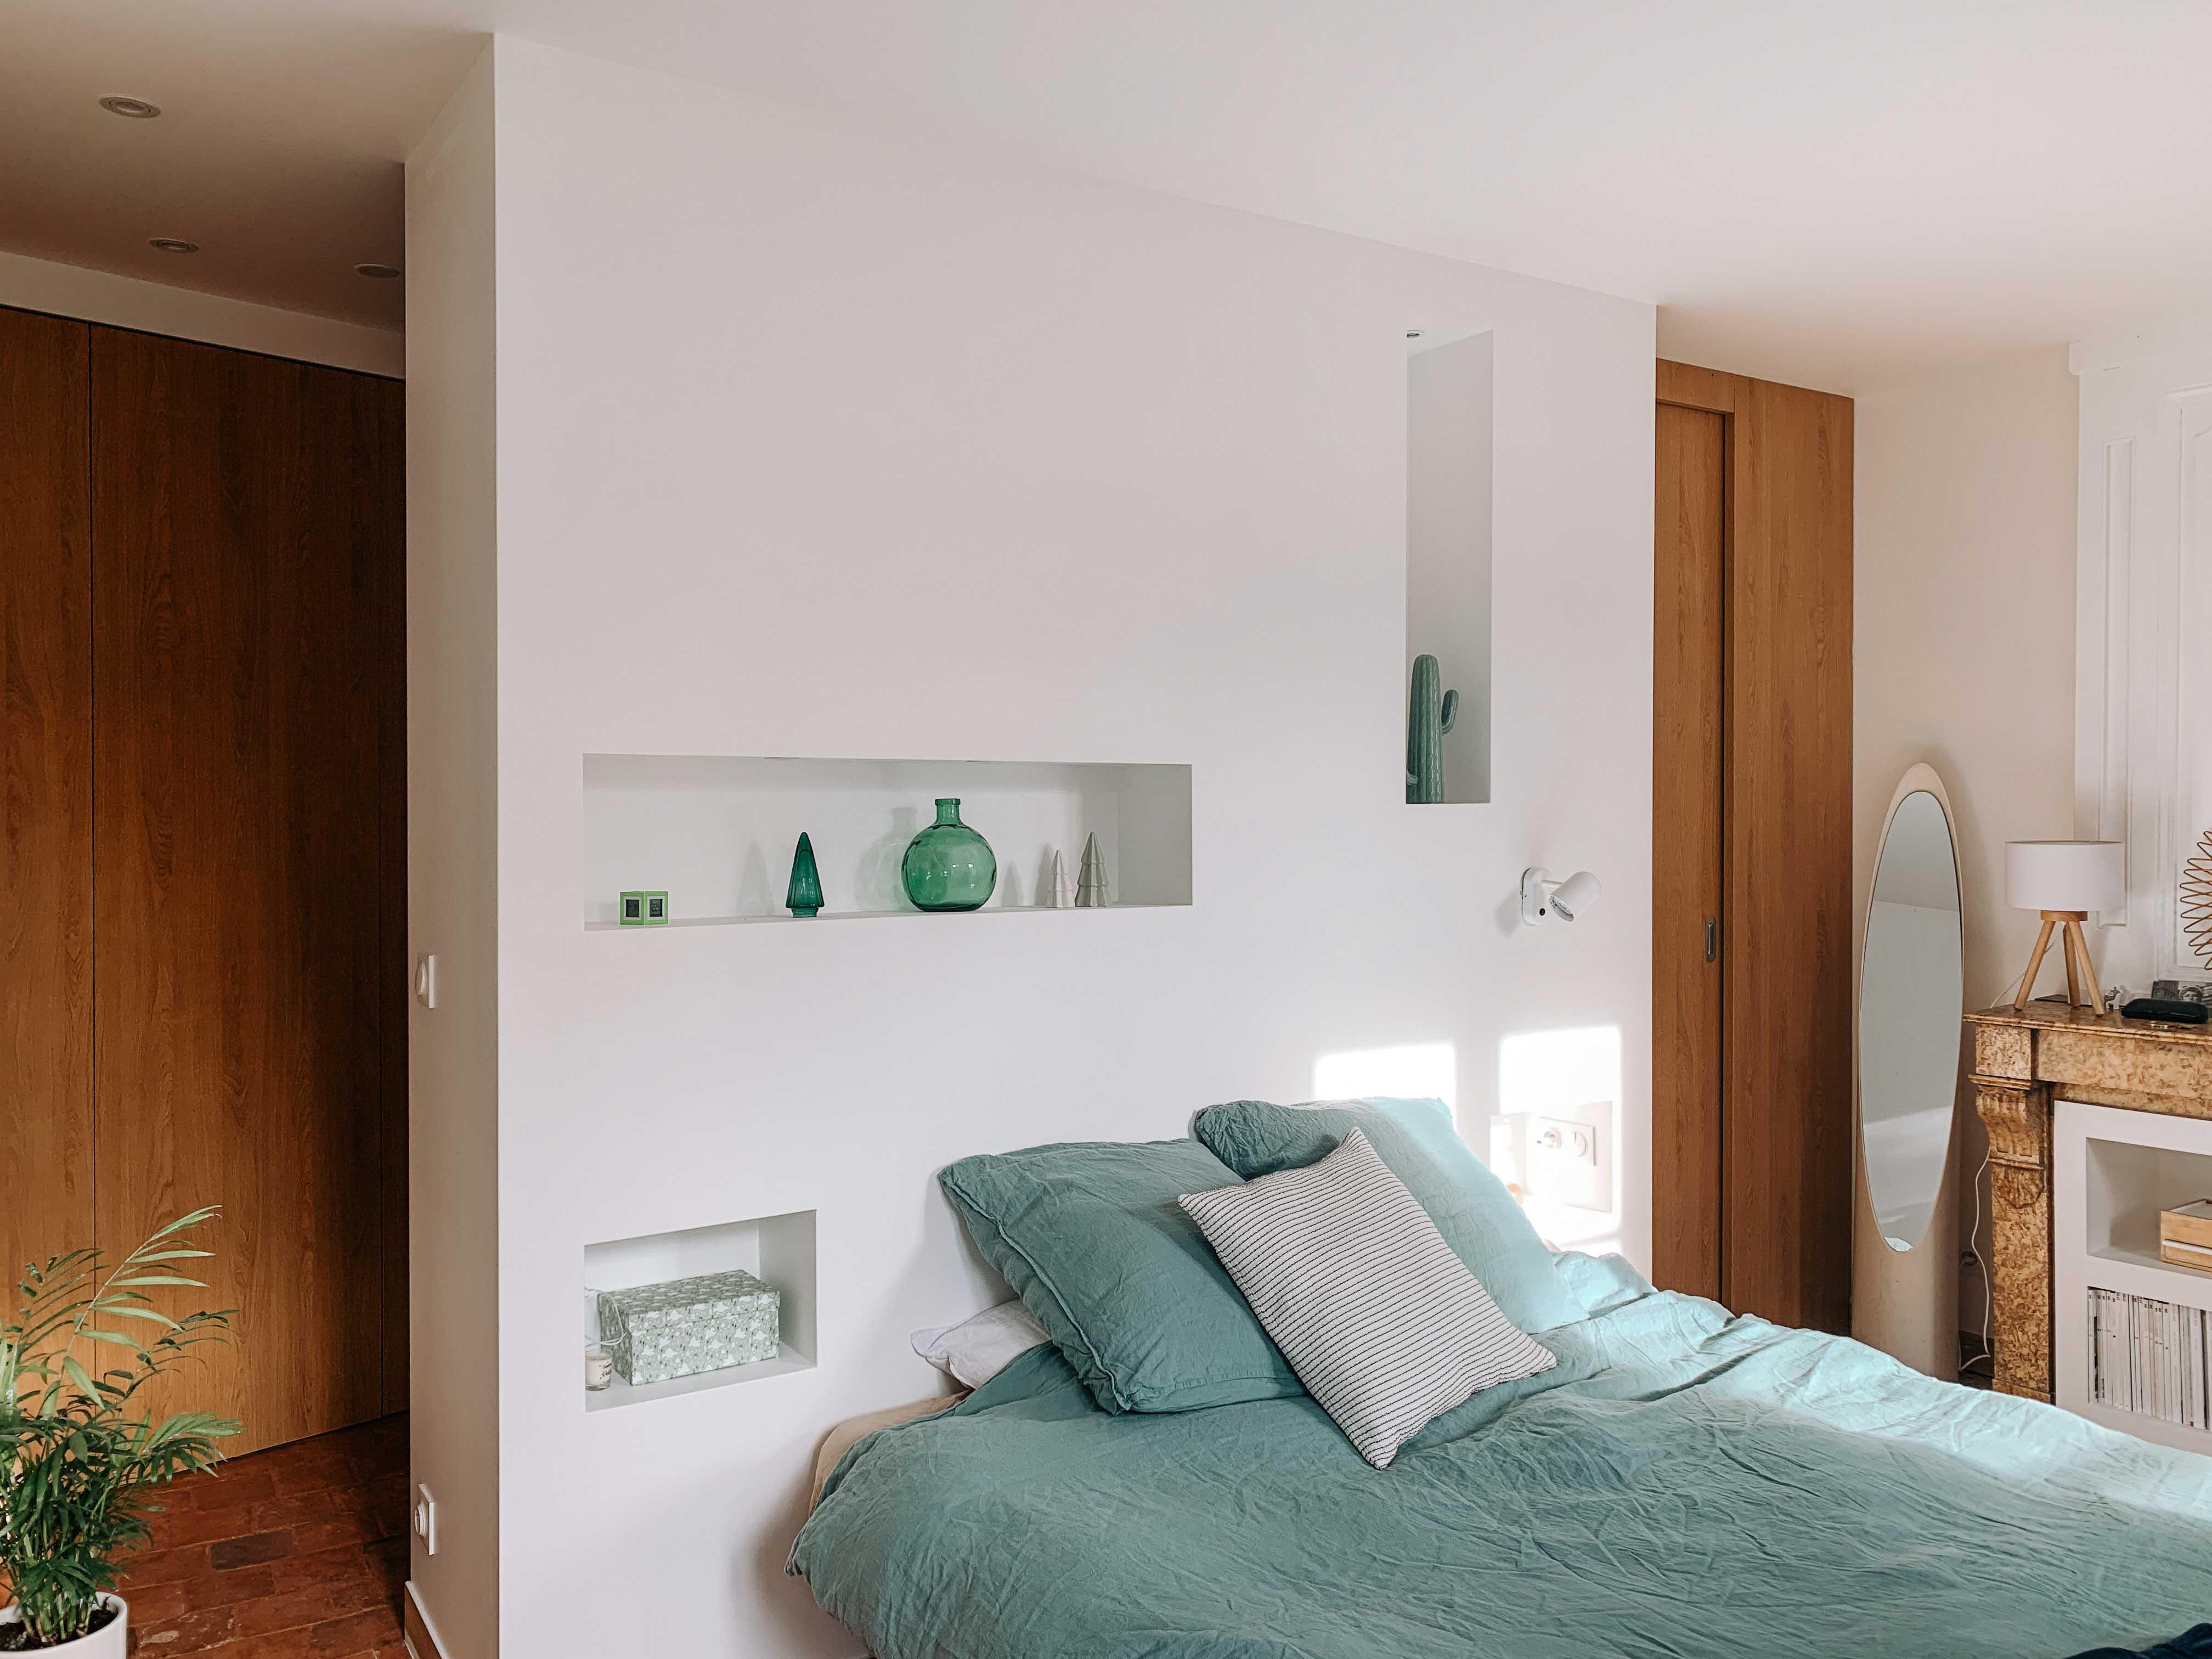 architecte-lyon-rénovation-presbytere-marcilly-azergues-pierre-dorée-35